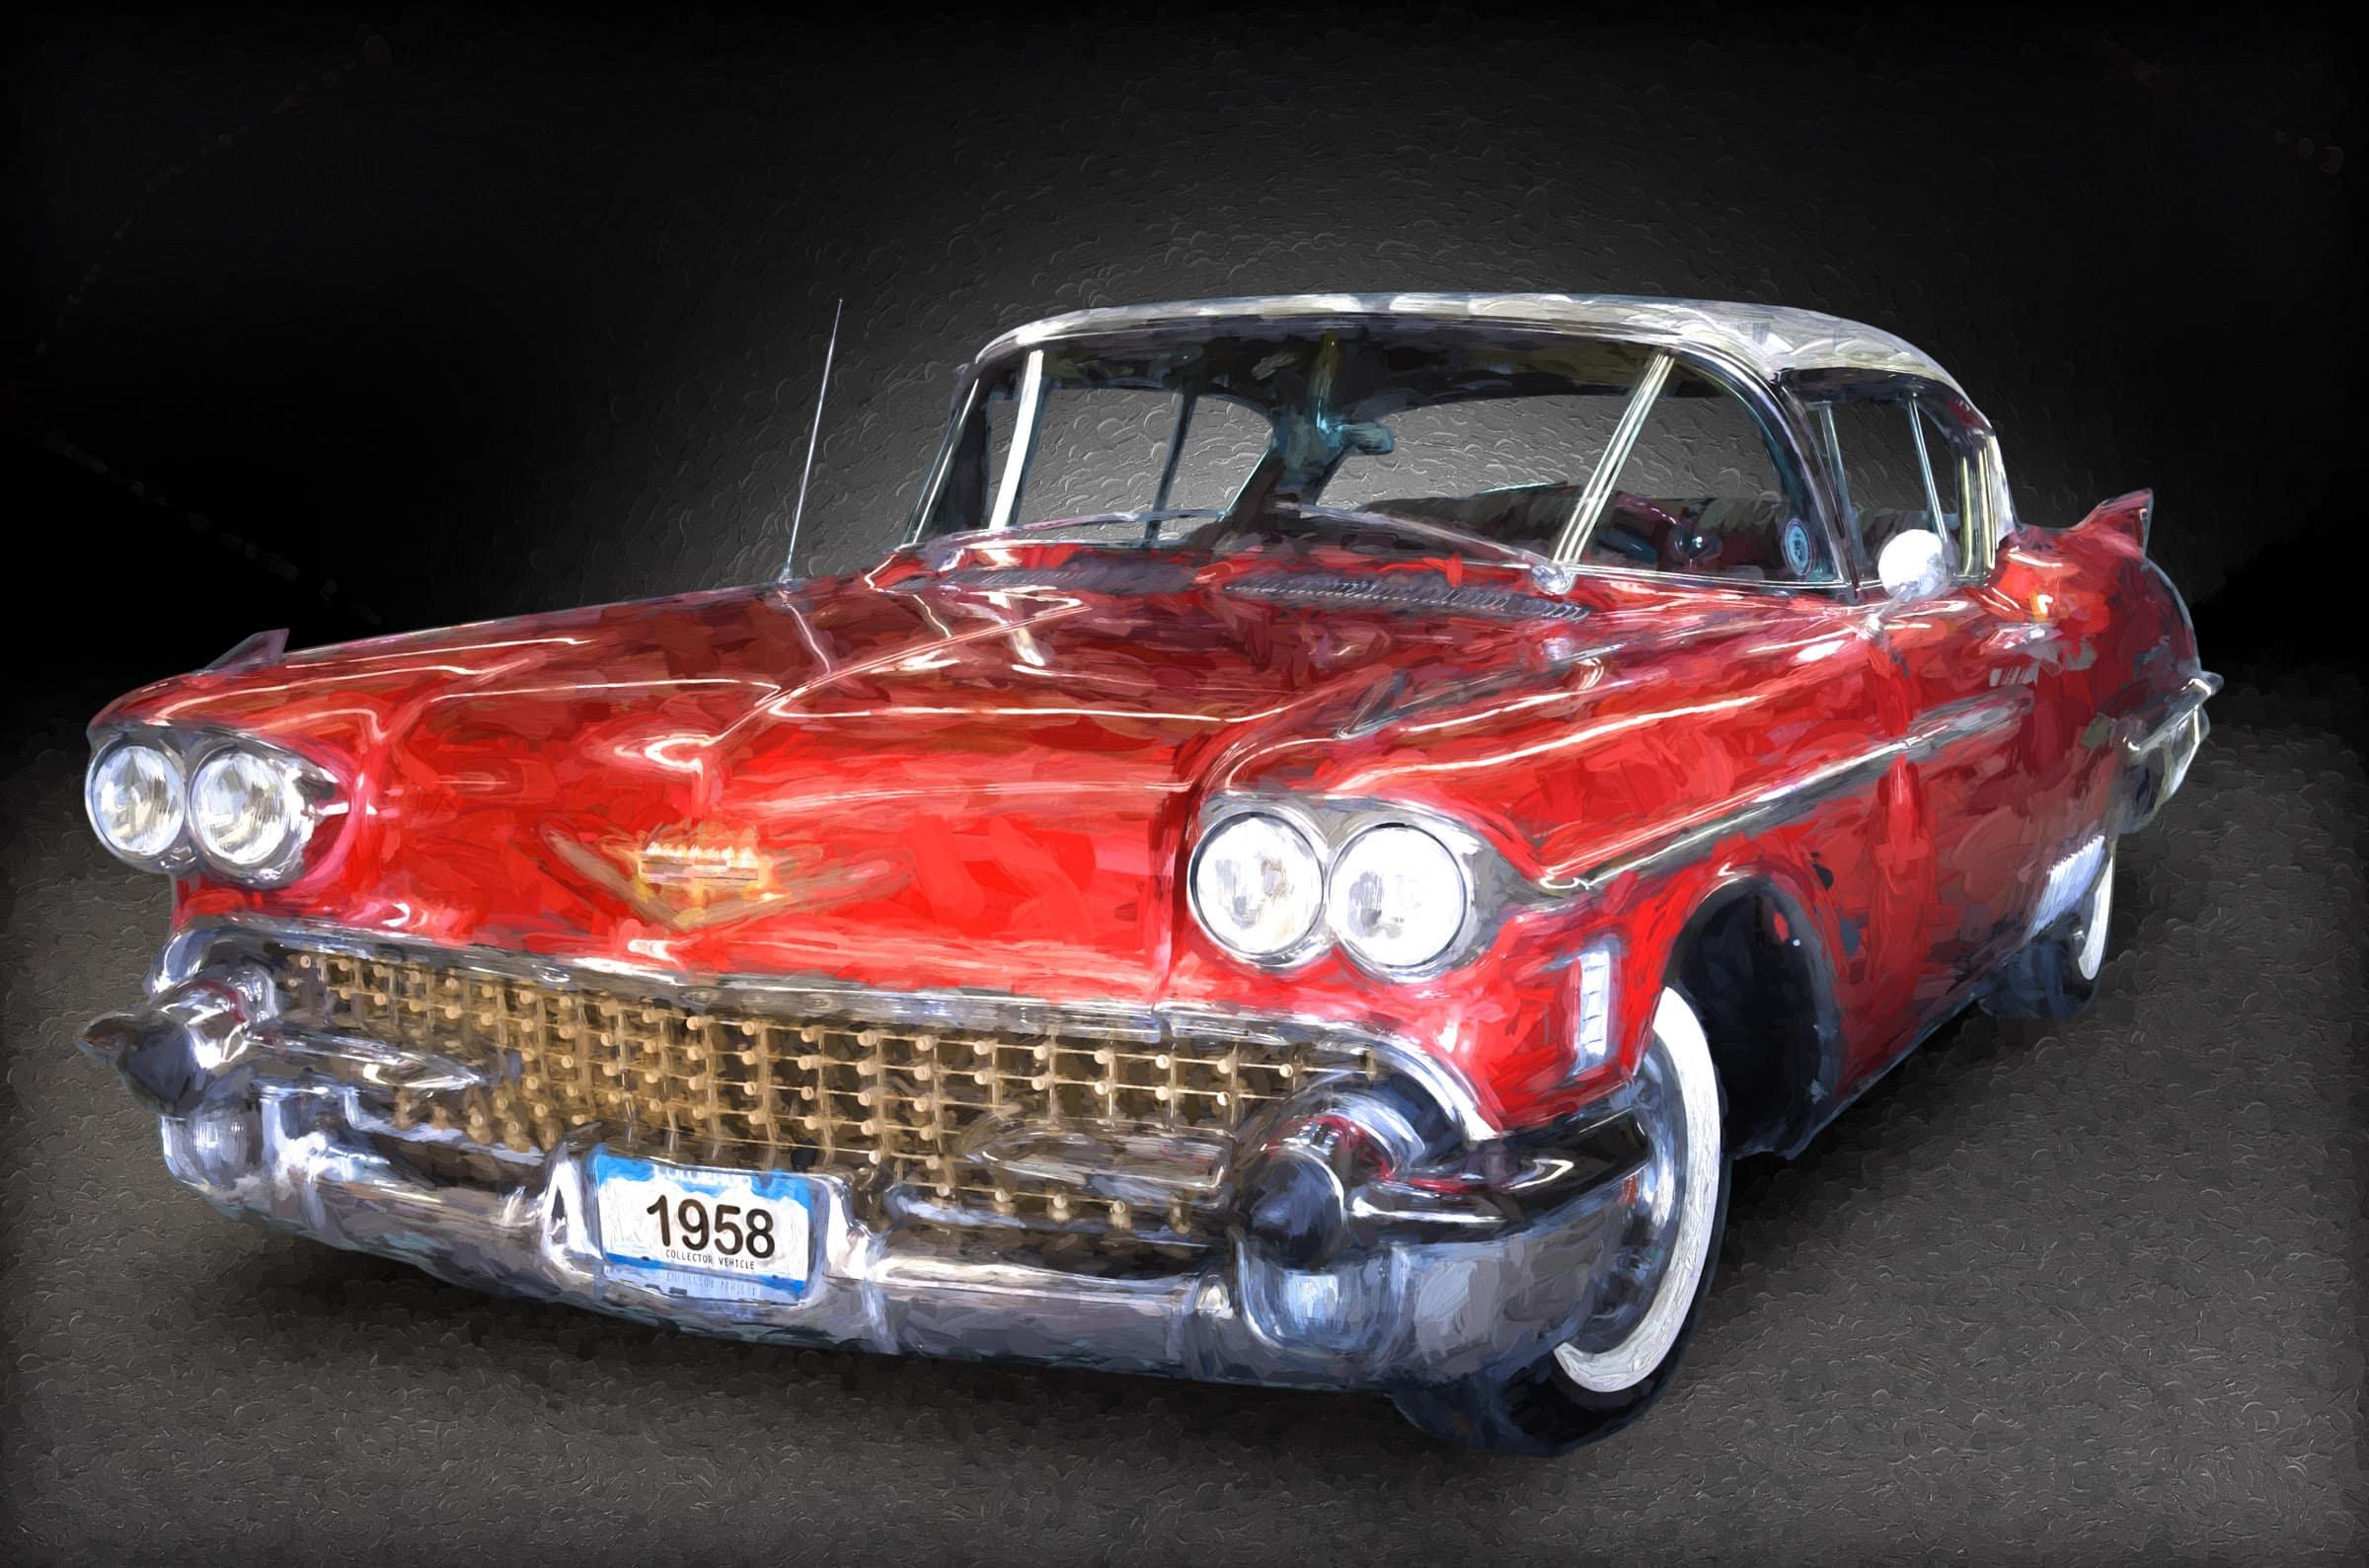 1958 Cadillac Eldorado Seville William Horton Photography